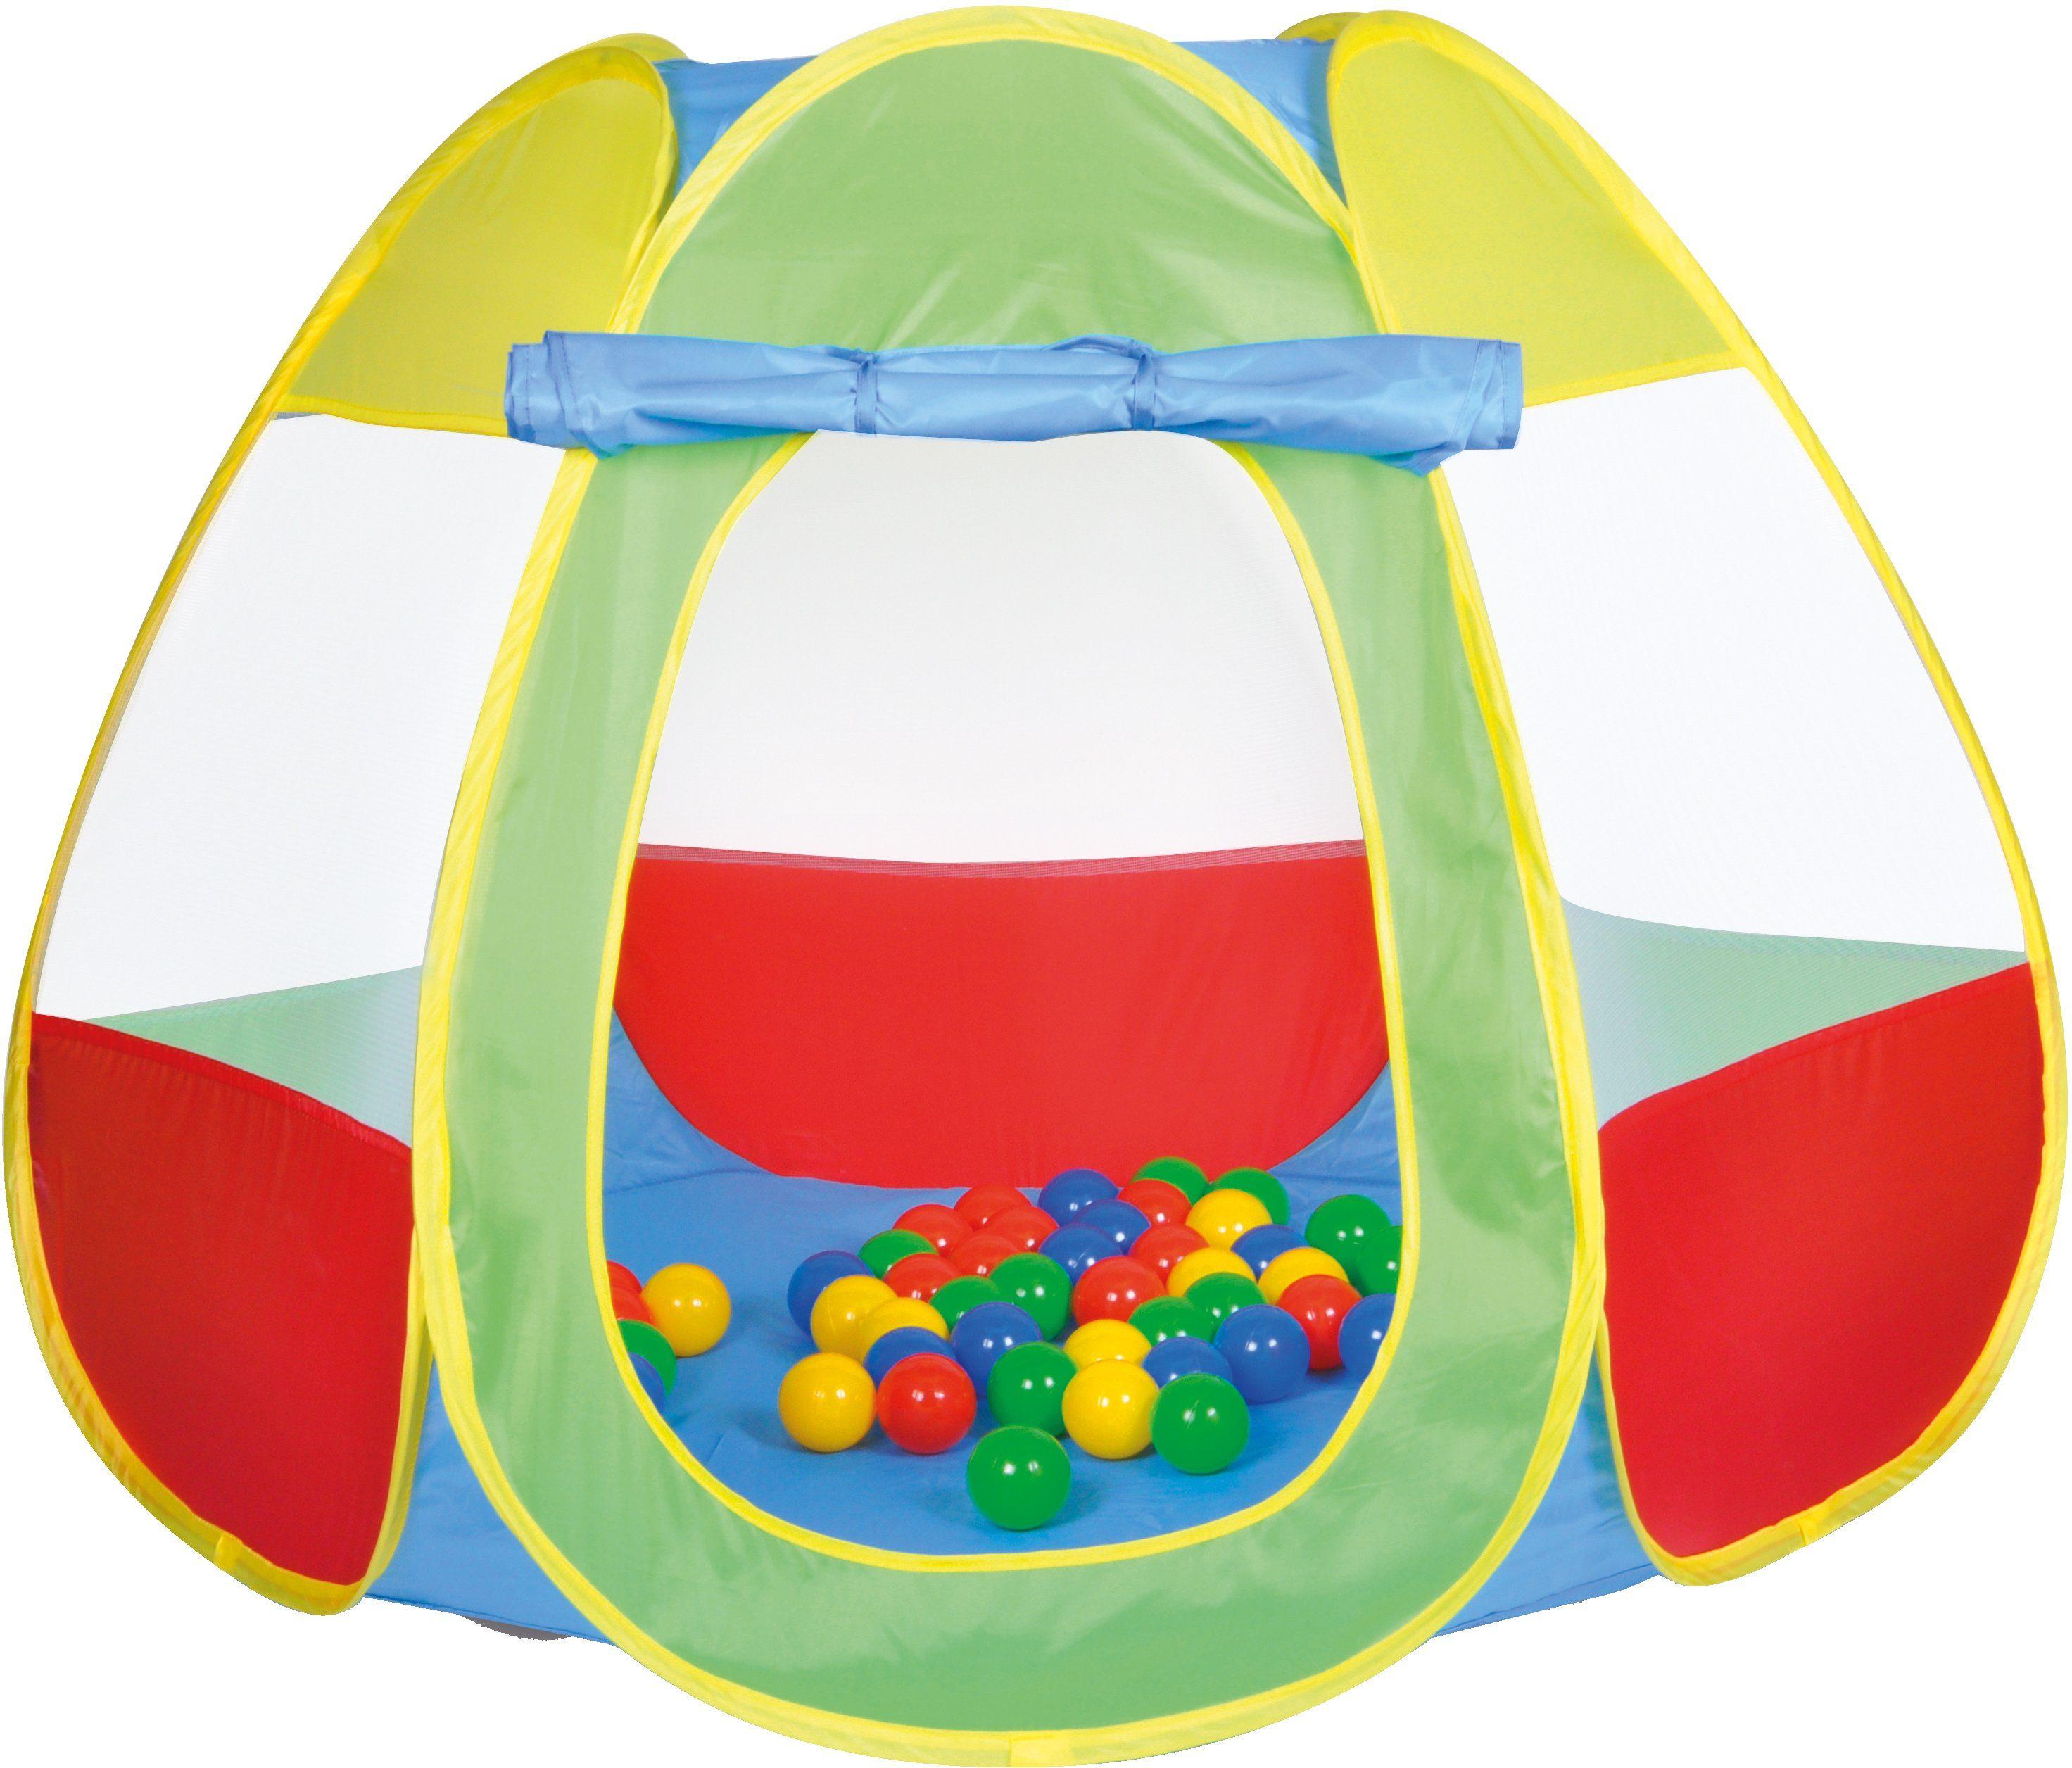 knorr toys Spielzelt inkl. 50 Spielbälle ca. Ø6 cm, »Bellox«